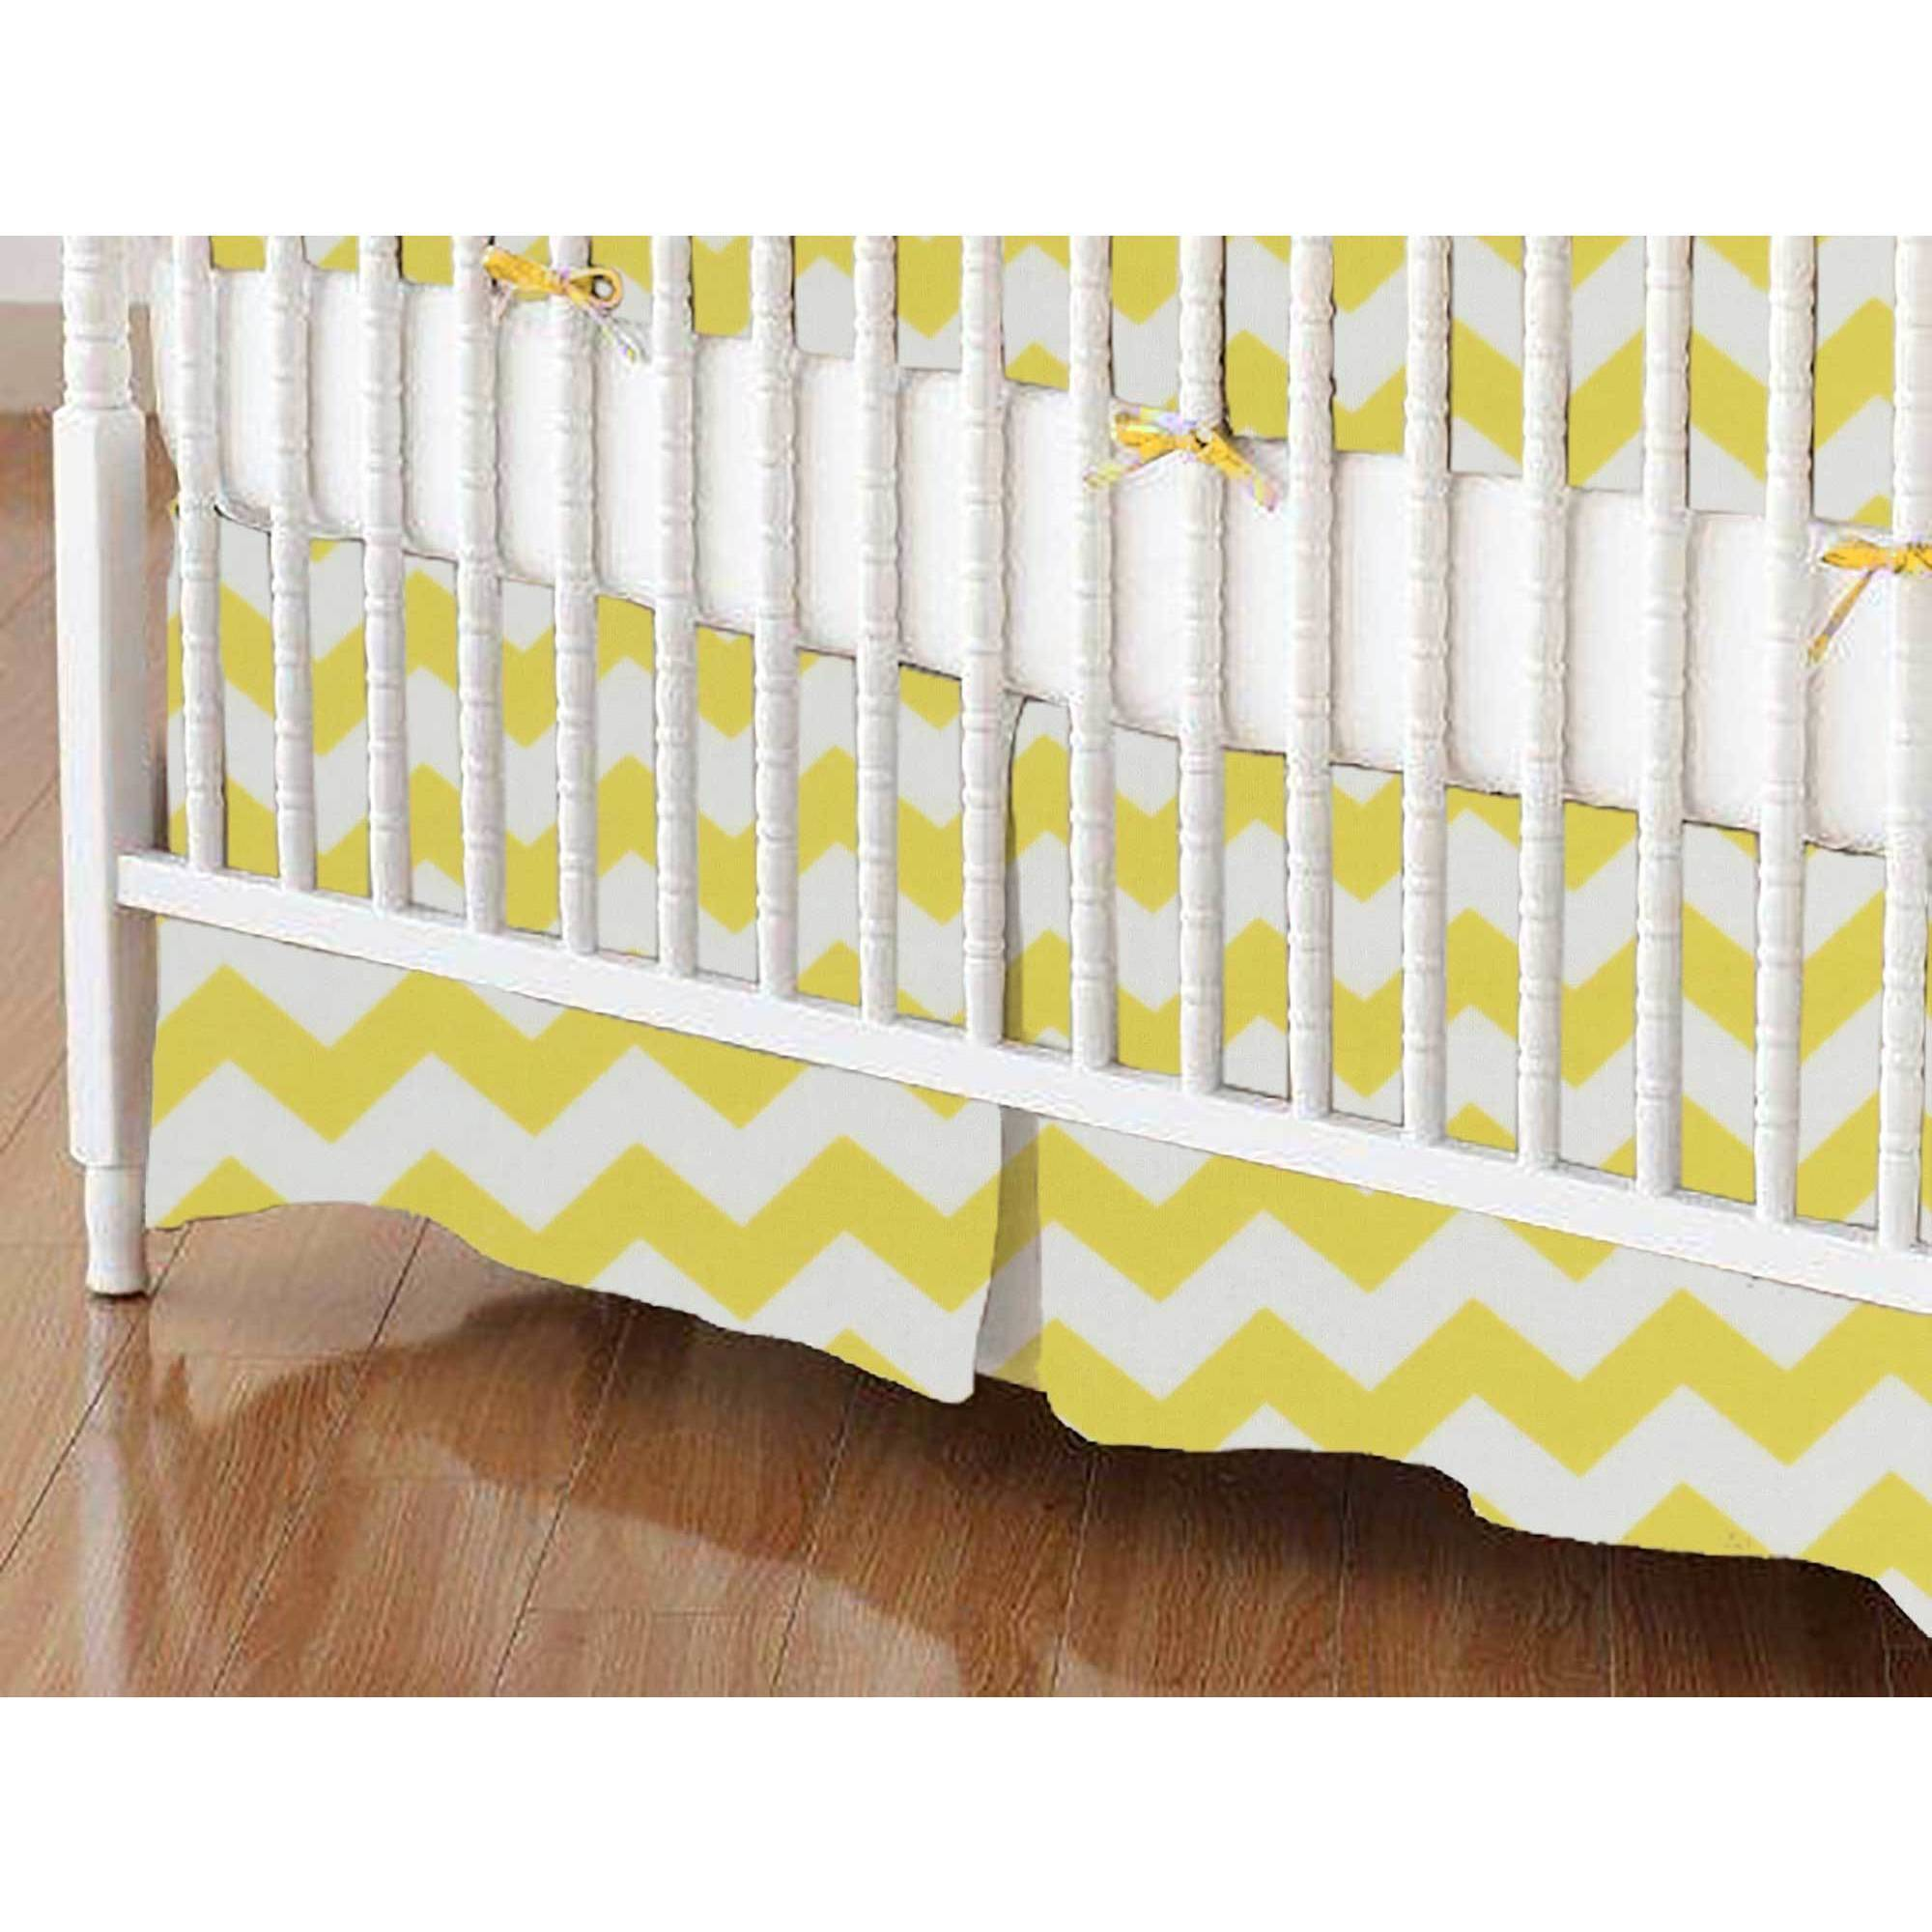 SheetWorld Crib Skirt - Yellow Chevron Zigzag